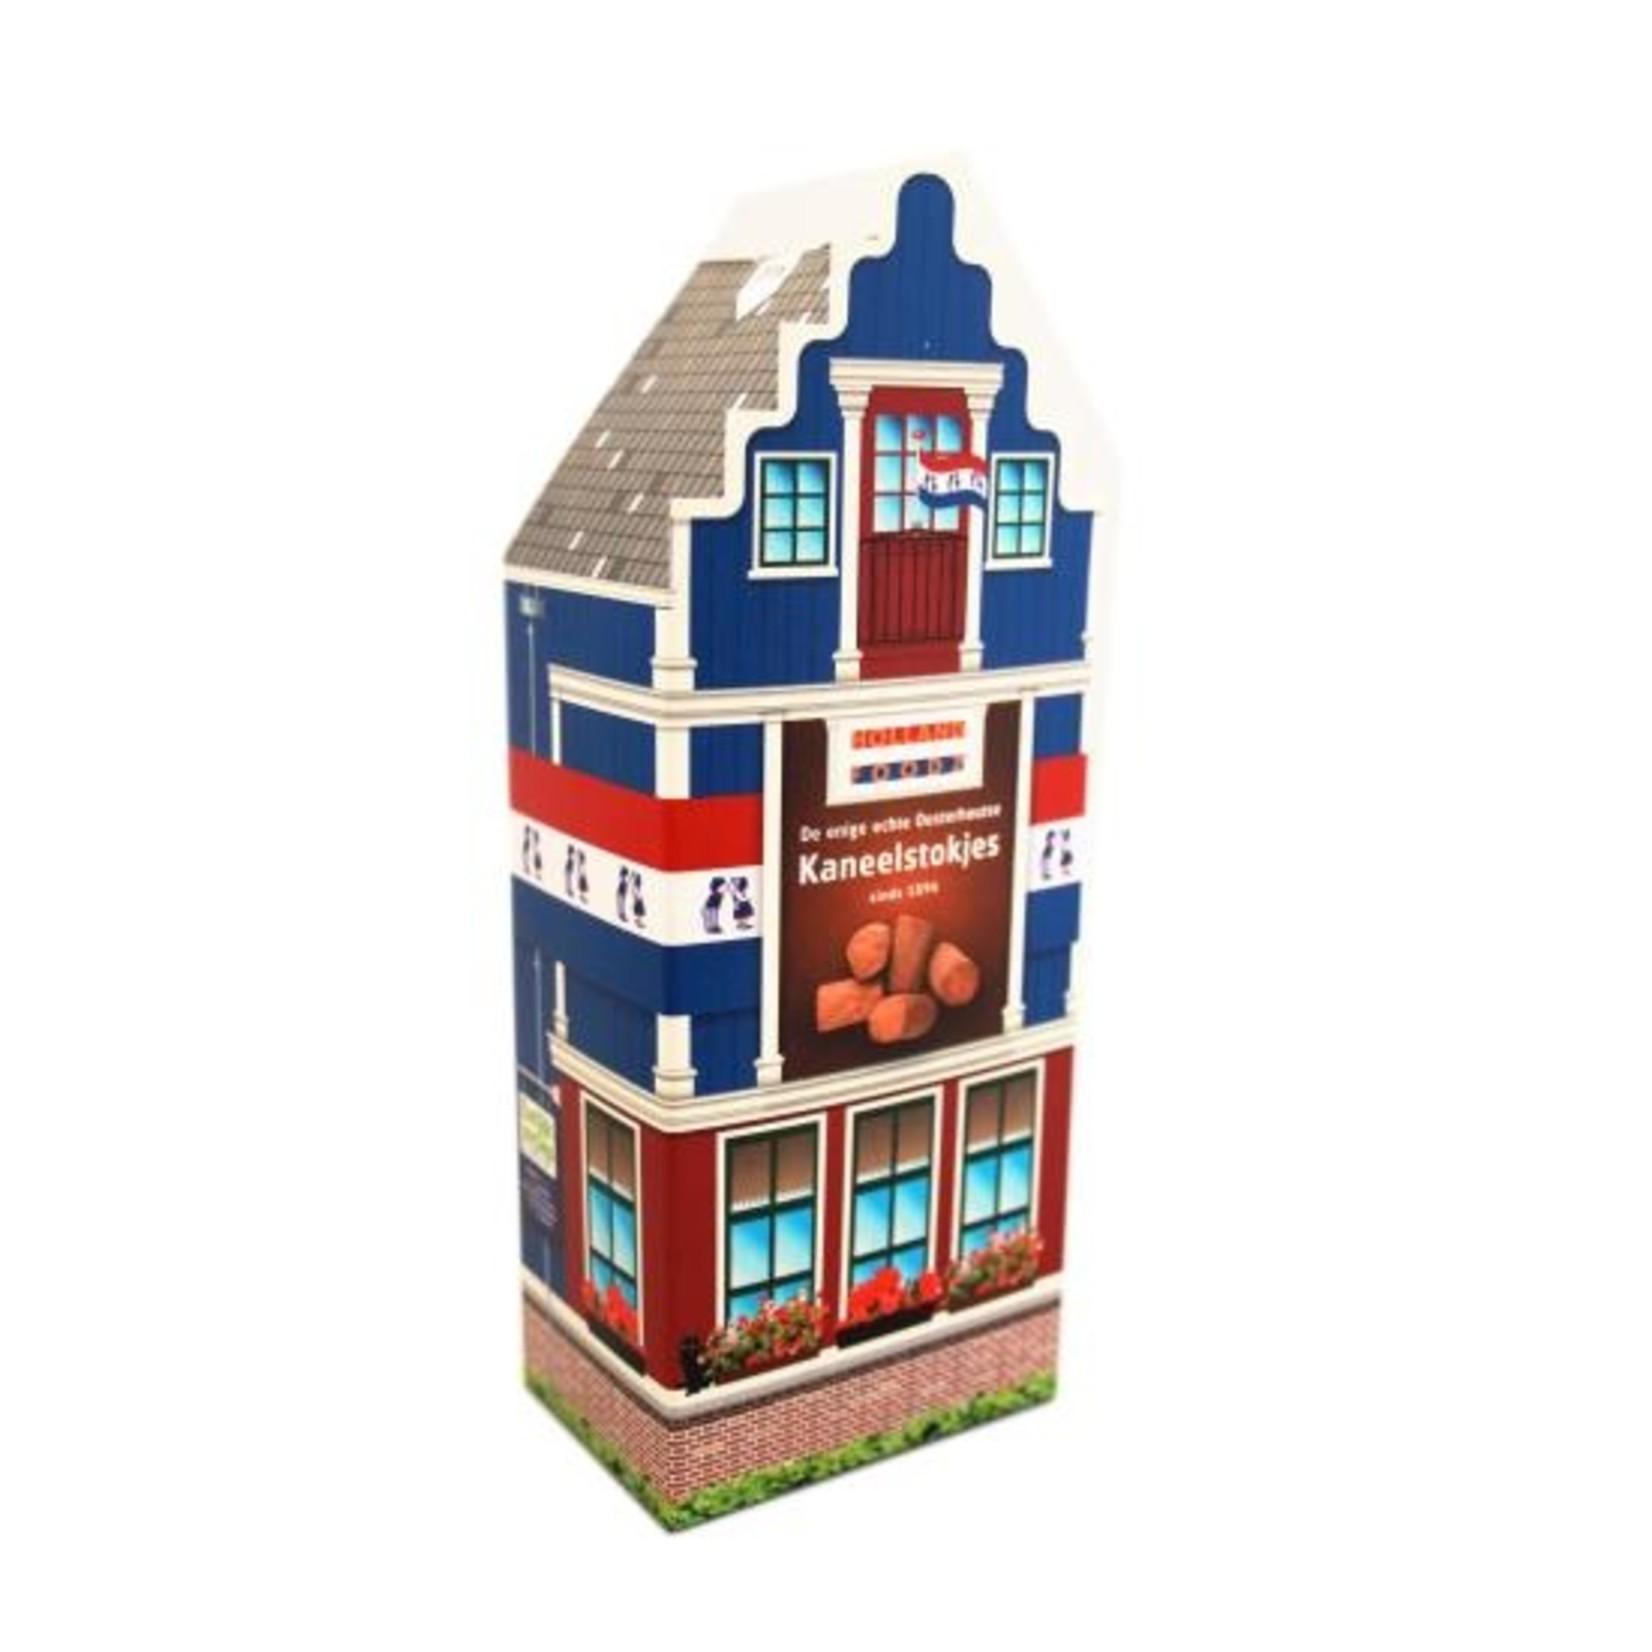 Oud Hollandz Kaneelstokjes in blik